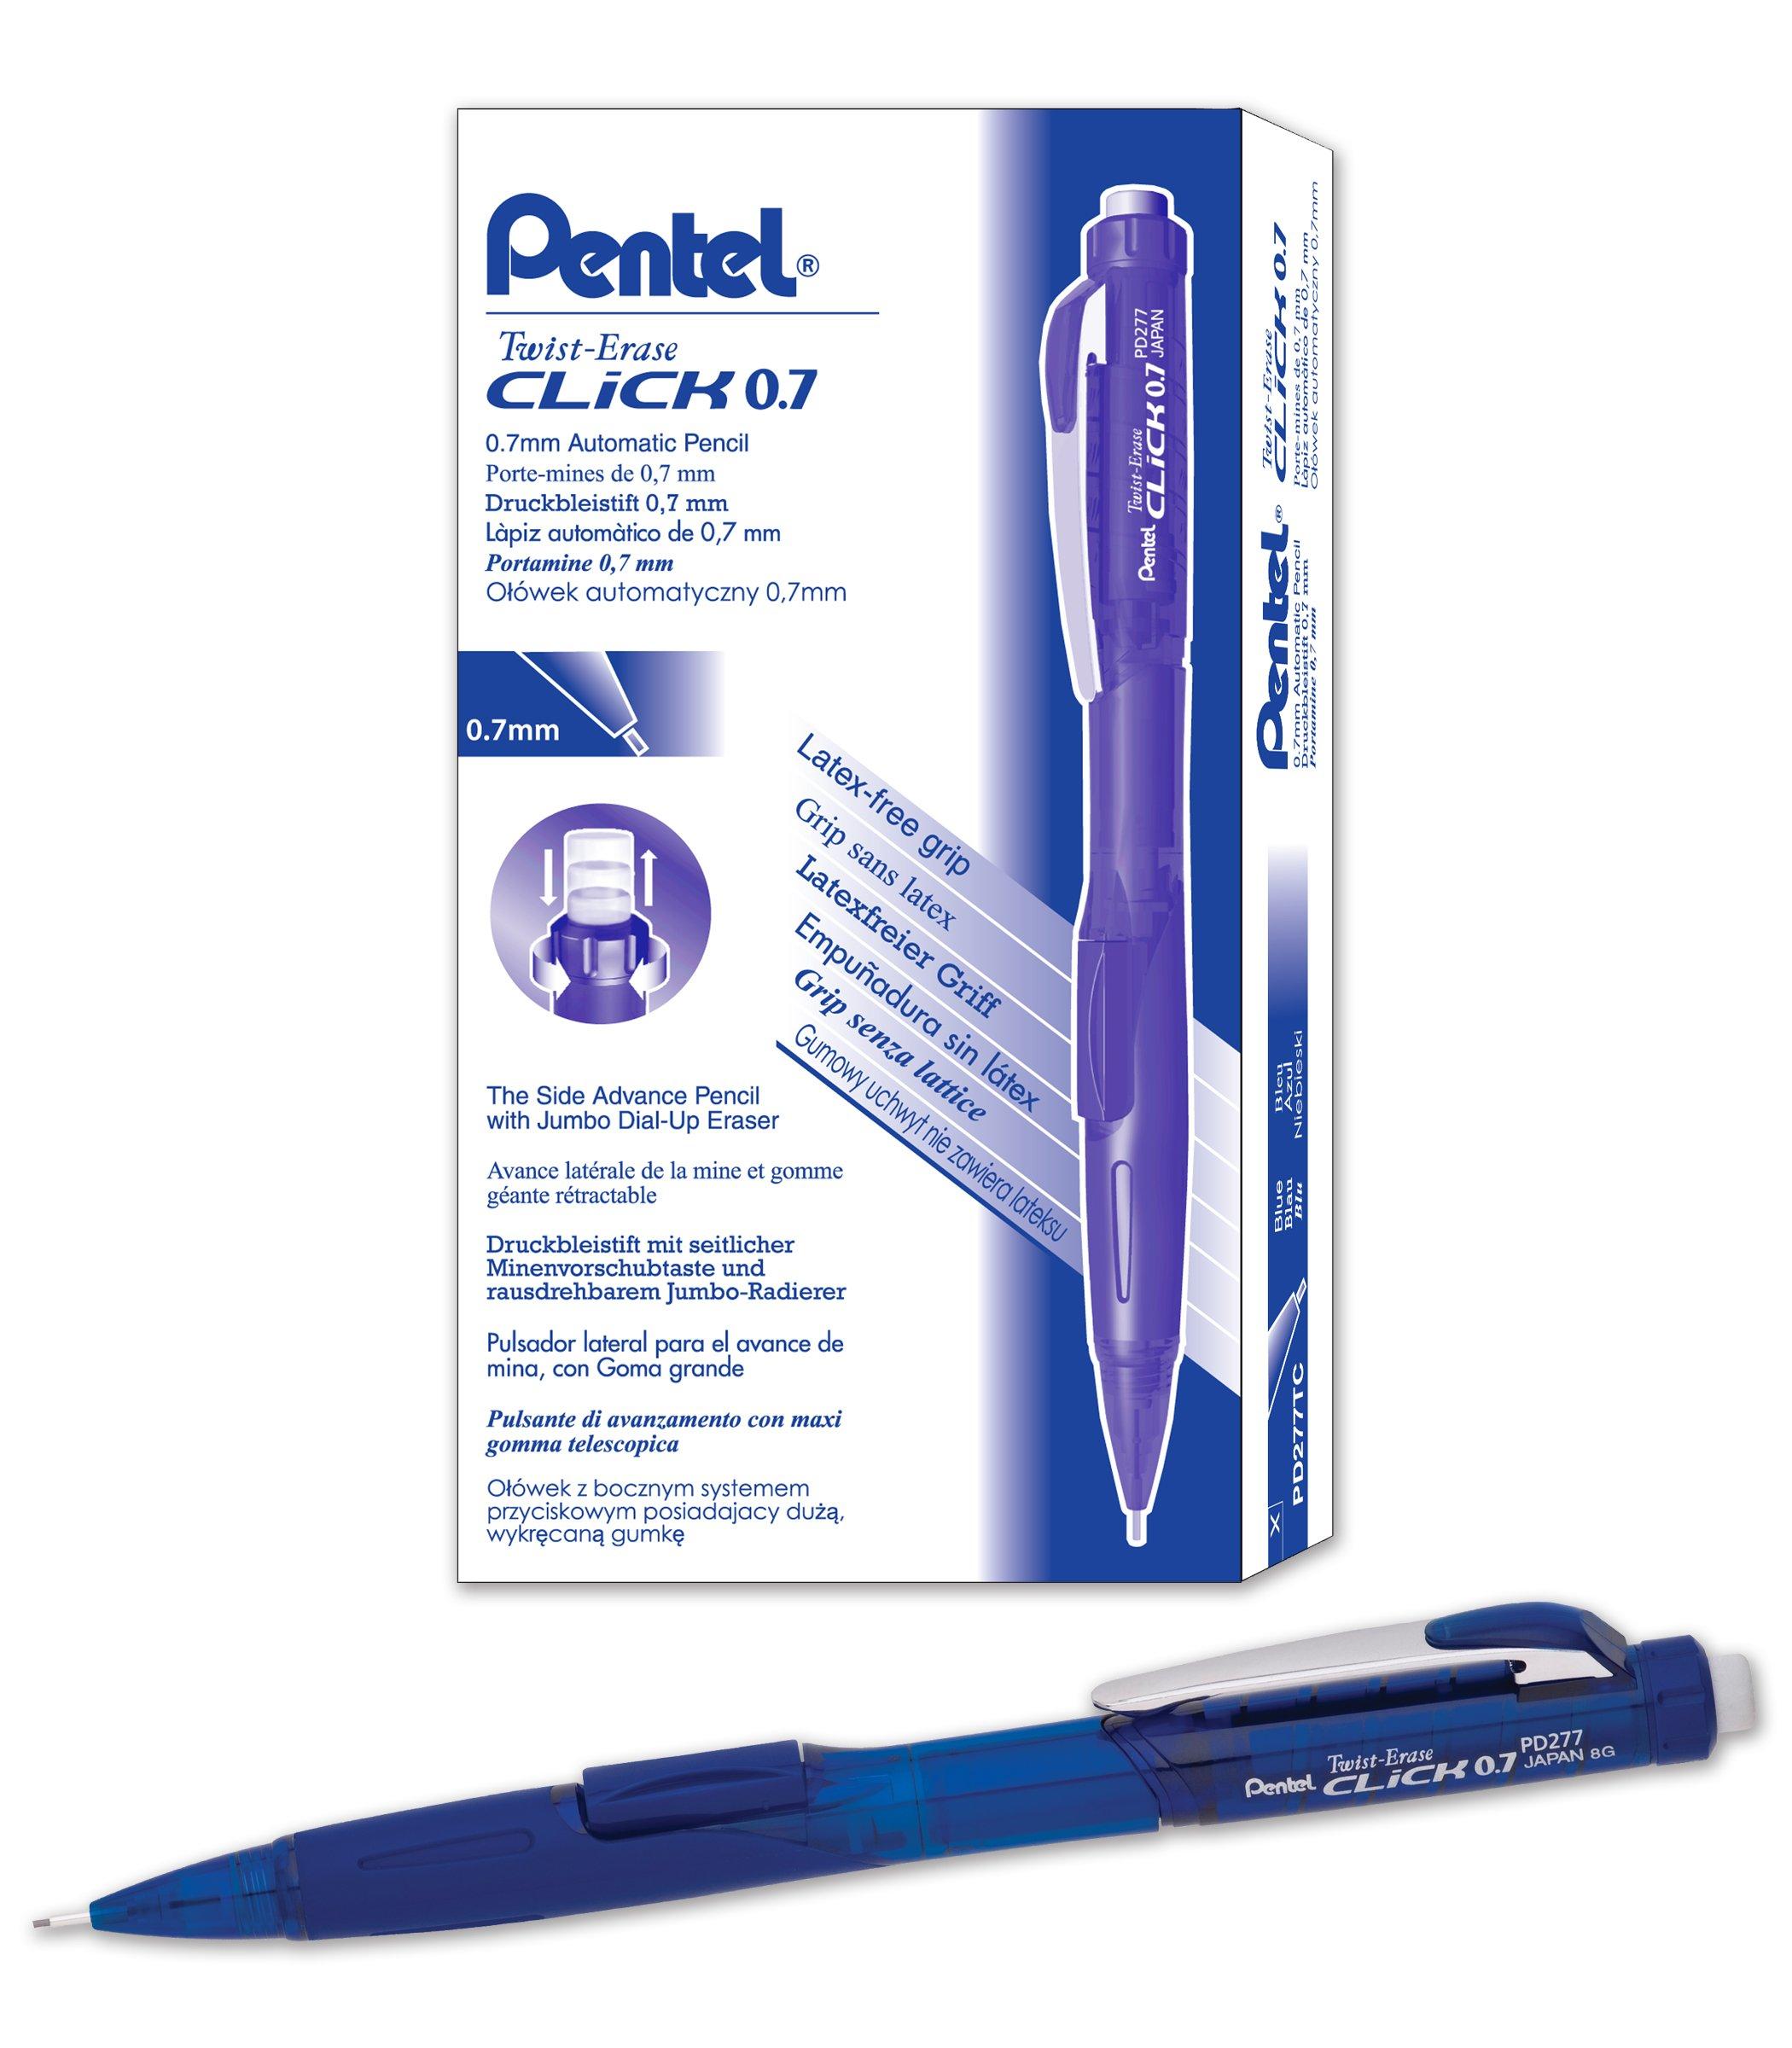 Pentel Twist-Erase CLICK Mechanical Pencil (0.7mm) Assorted Blue Barrel Colors, Color May Vary, Box of 12 (PD277TC)